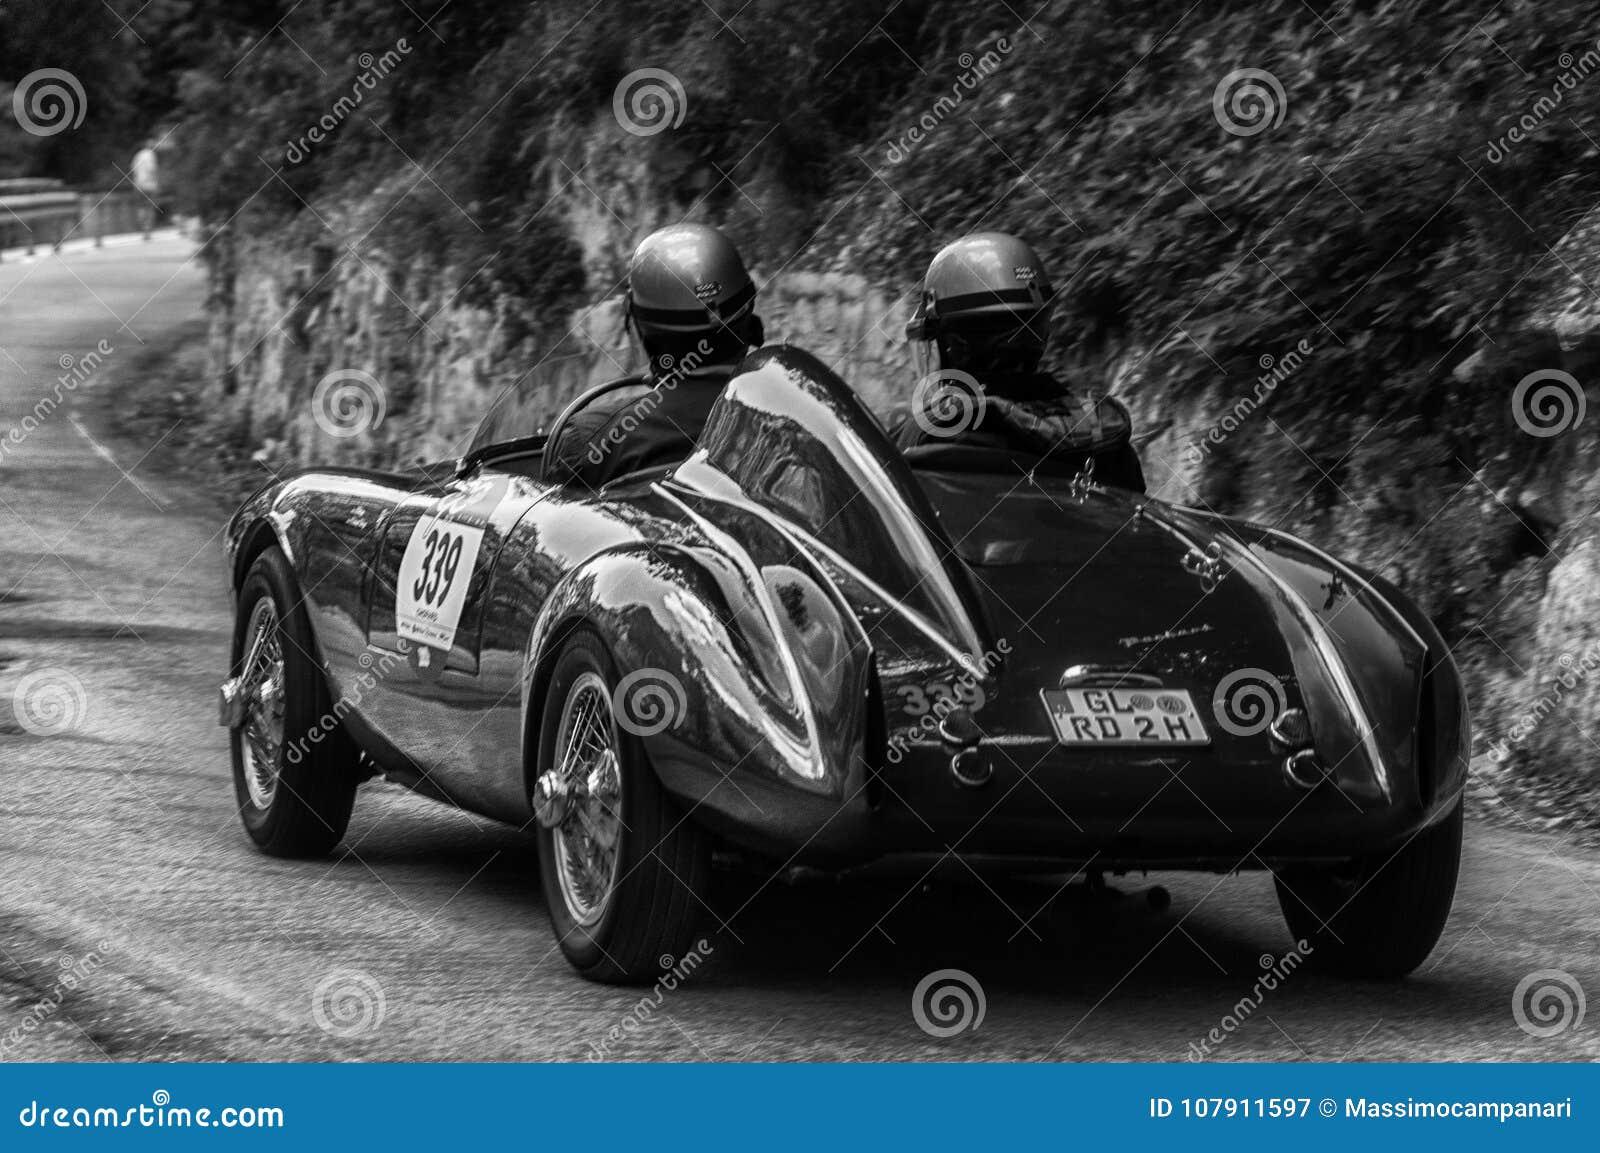 BIANCHI PANHARD ITALFRANCE 750 S COLLI 1954 On An Old Racing Car In ...